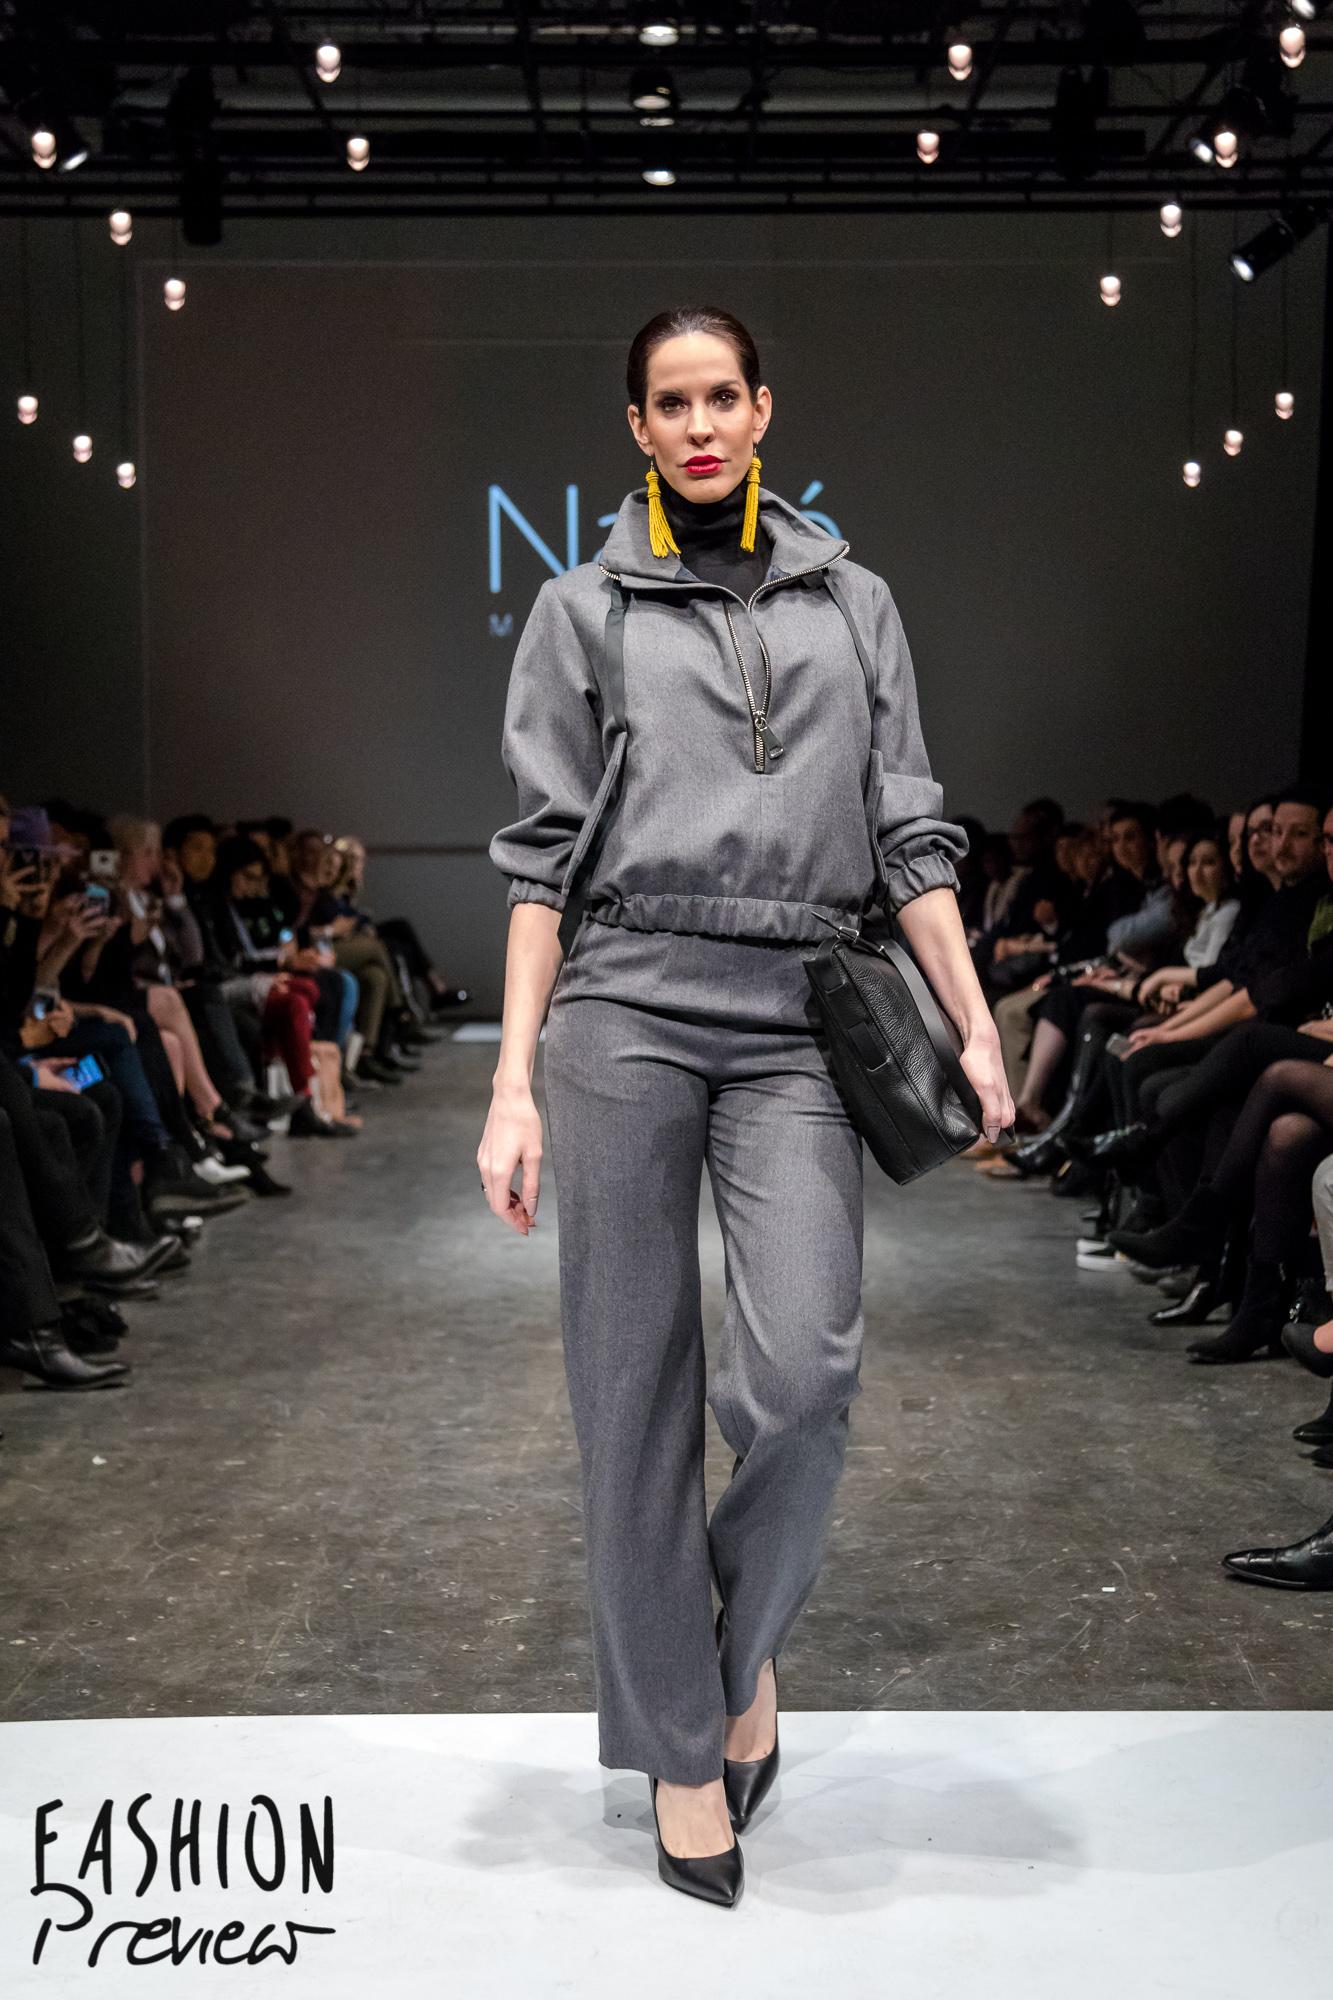 Fashion Preview 9 - Naike-10.jpg